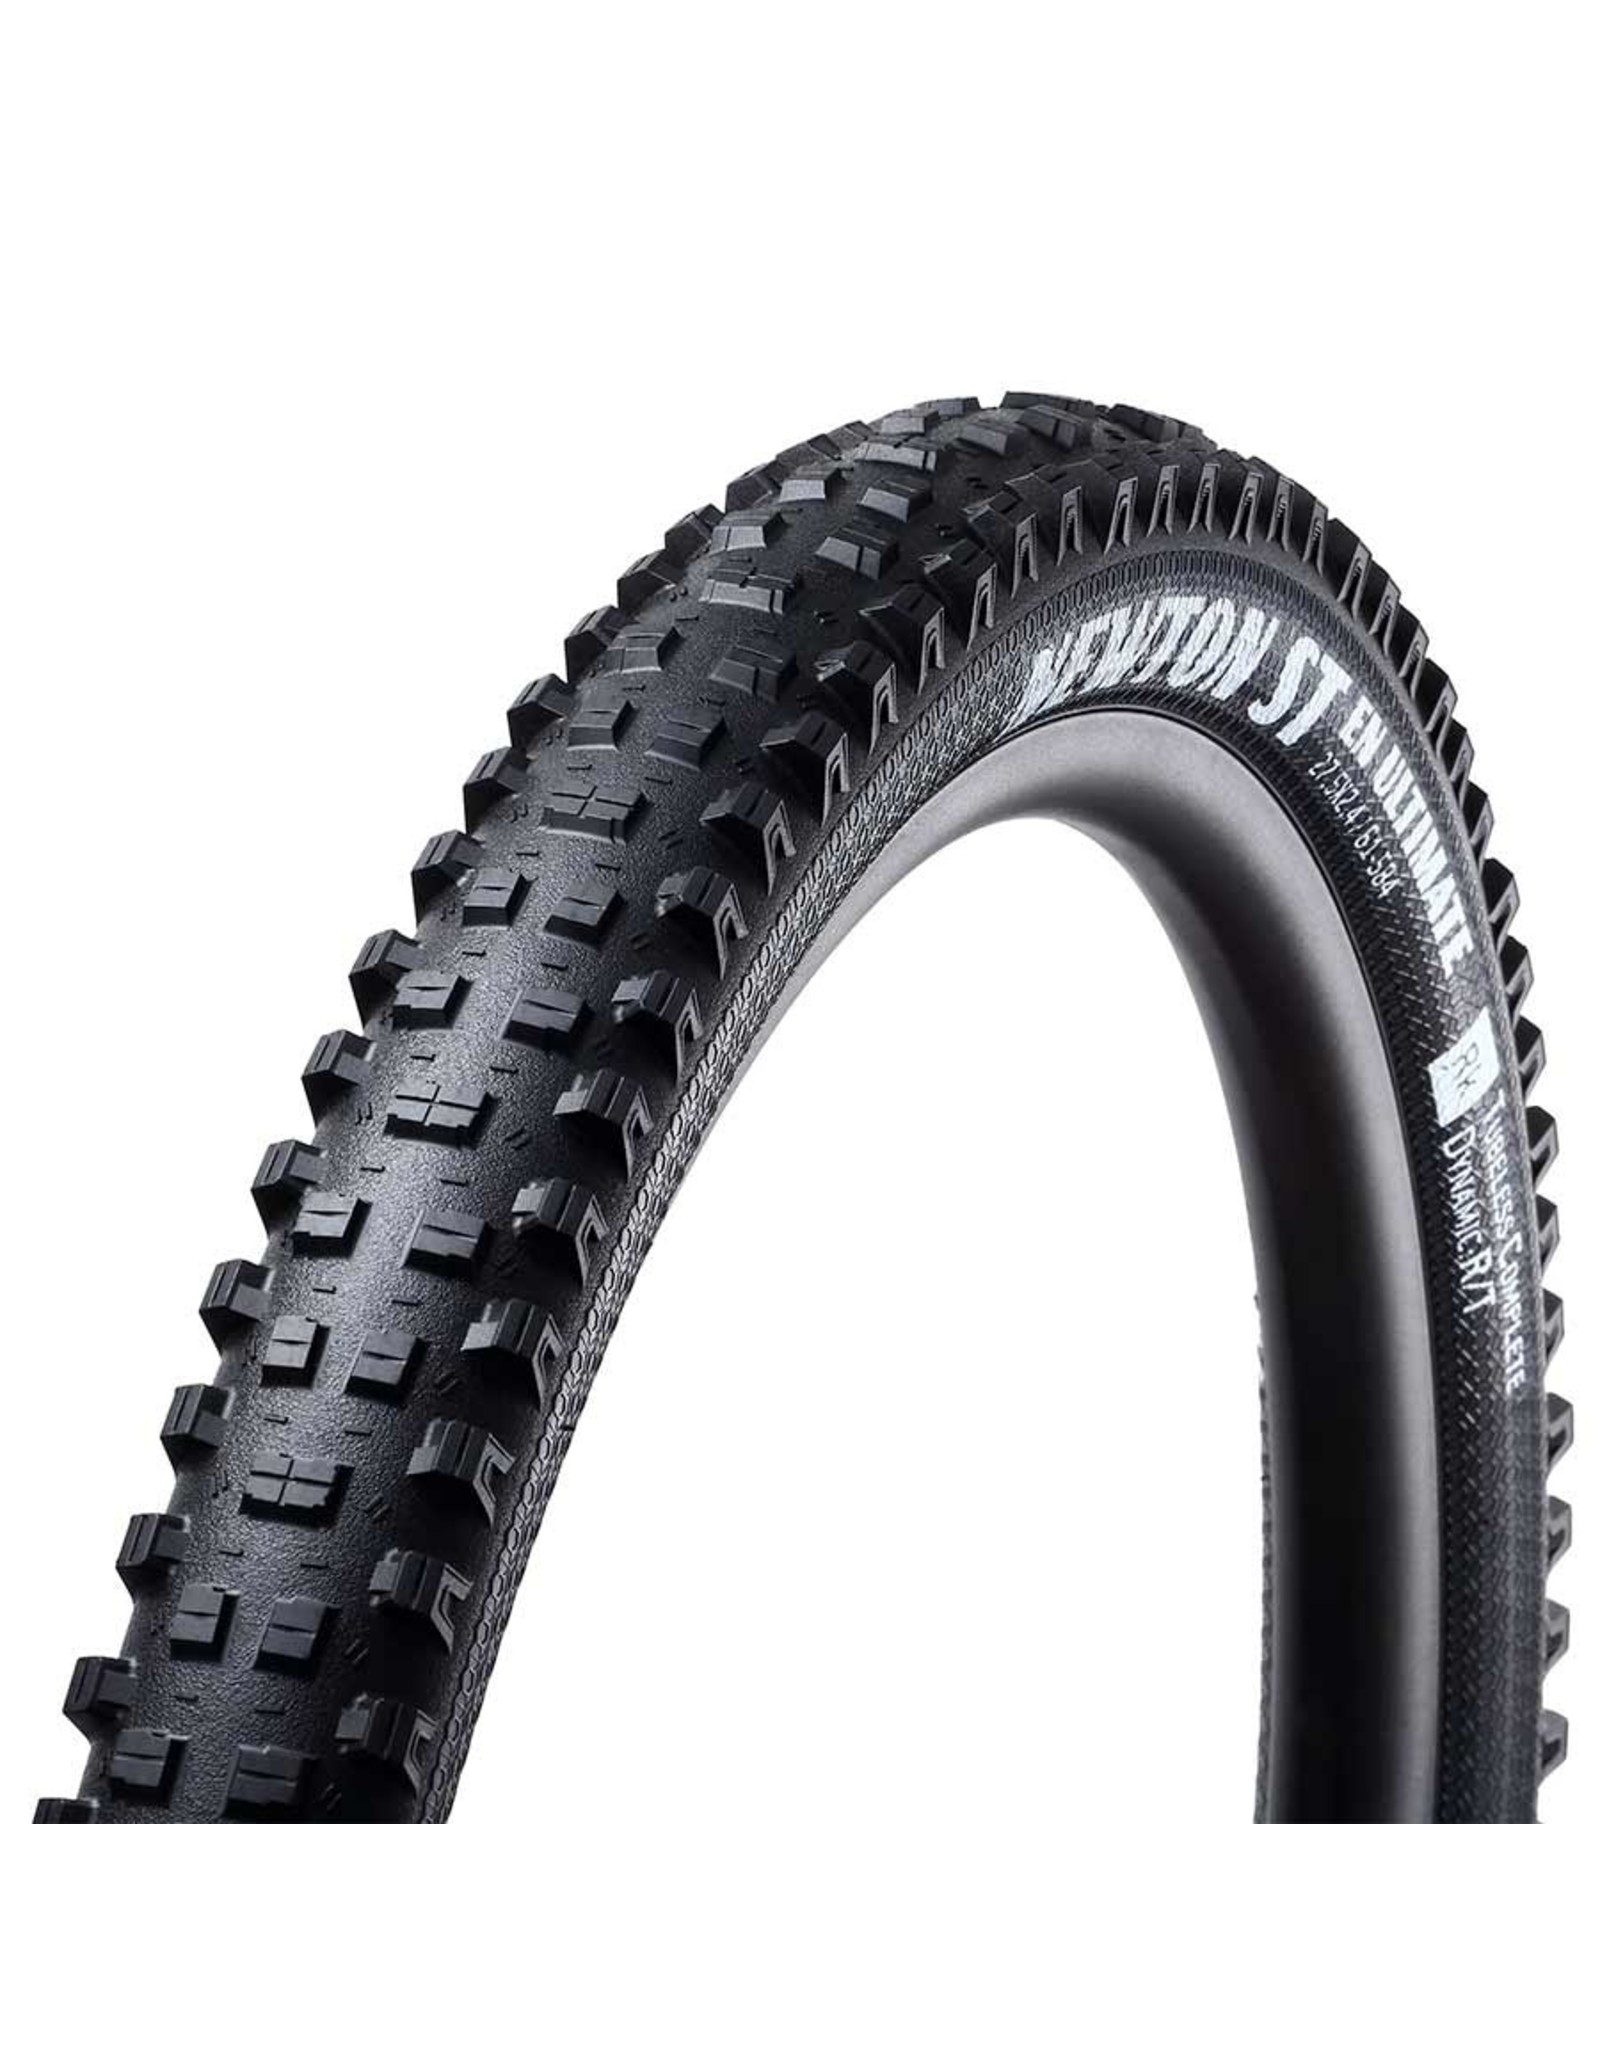 Goodyear Goodyear, Newton-ST, Tire, 29''x2.40, Folding, Tubeless Ready, Dynamic:R/T, EN Ultimate, 240TPI, Black